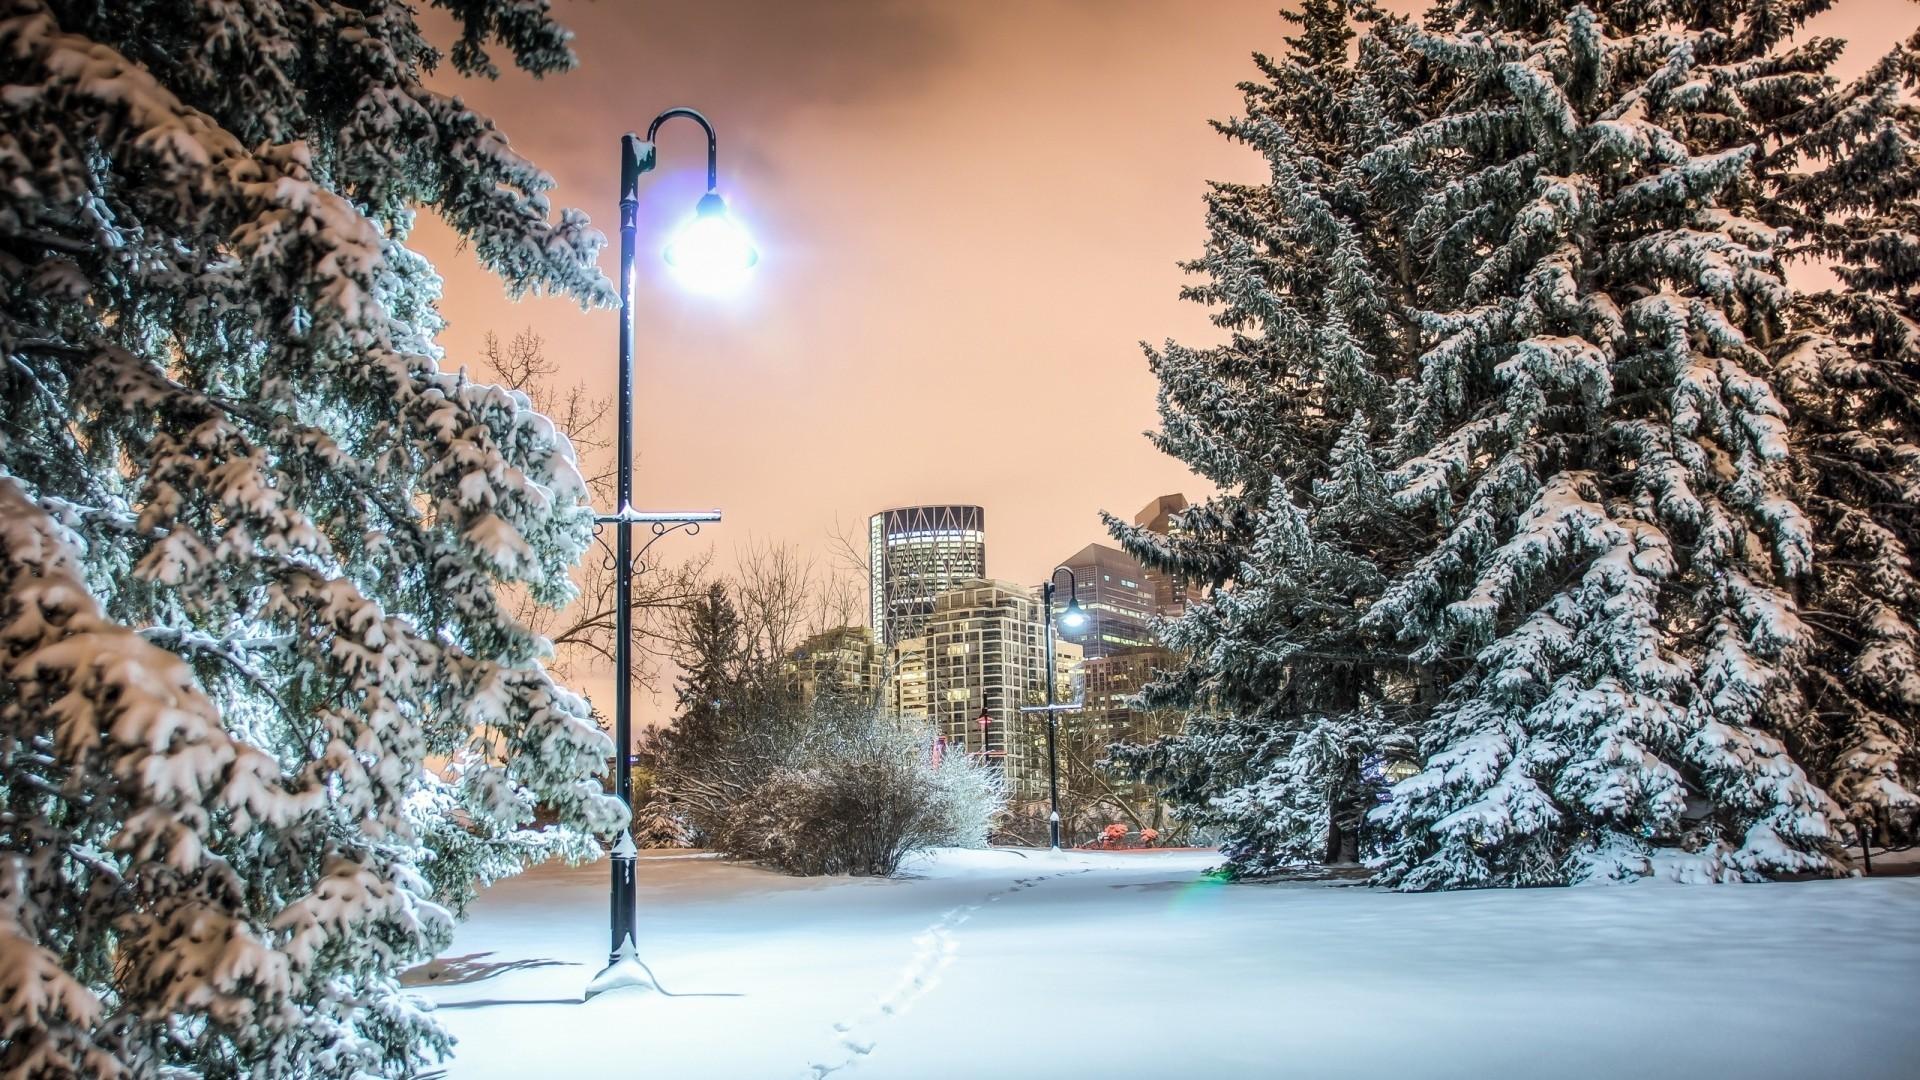 Post Tag – Winter Wondrous Light City Trees Park Post Wallpaper Desktop  Free for HD 16